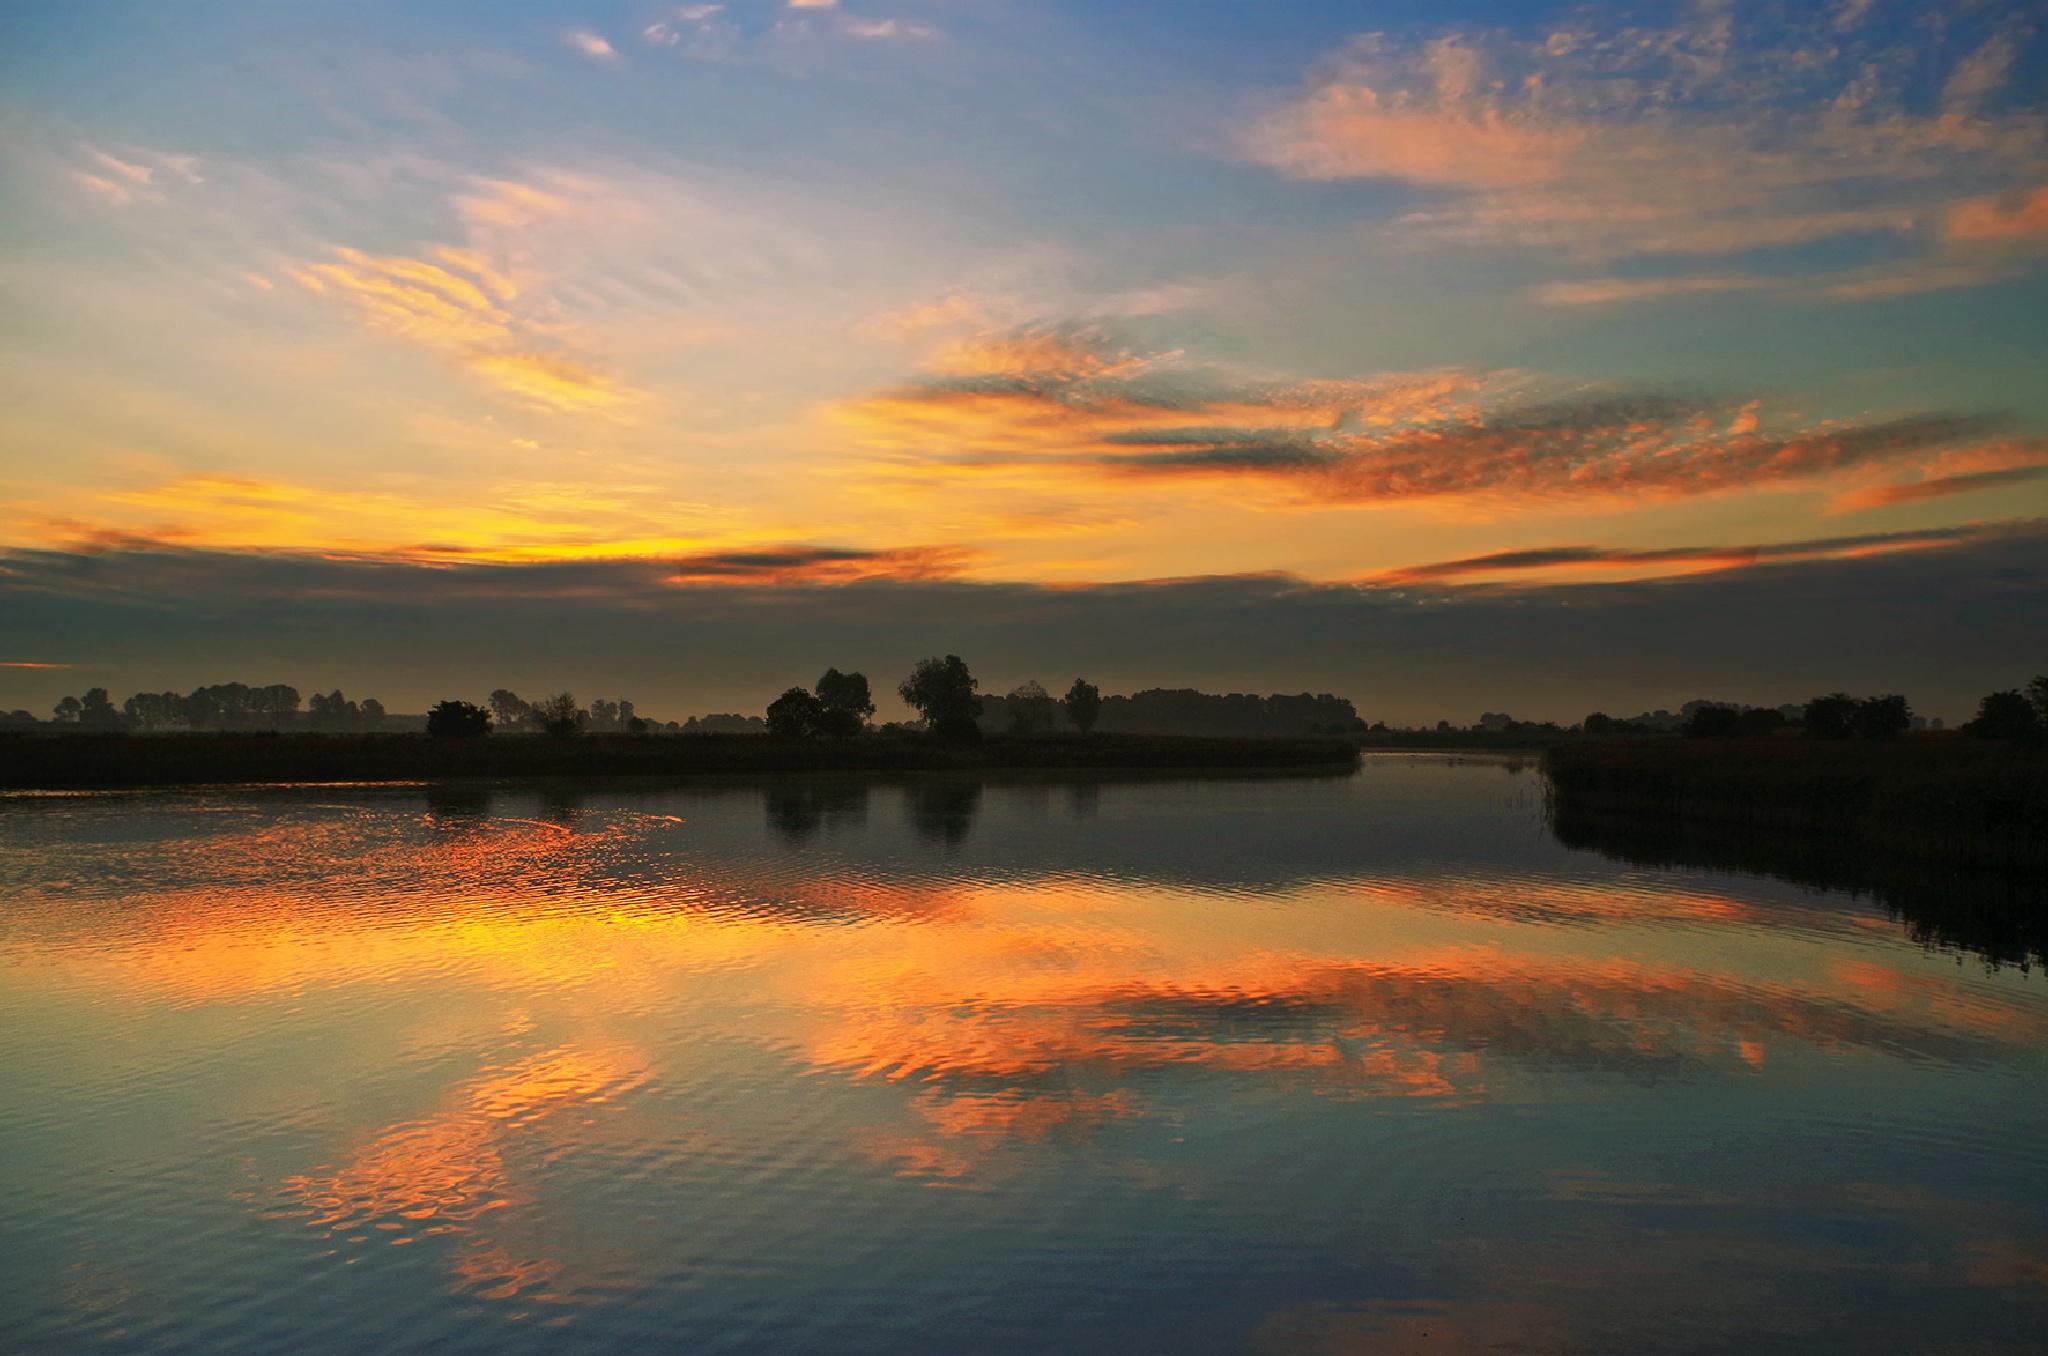 dawn by Tomasz Marciniak